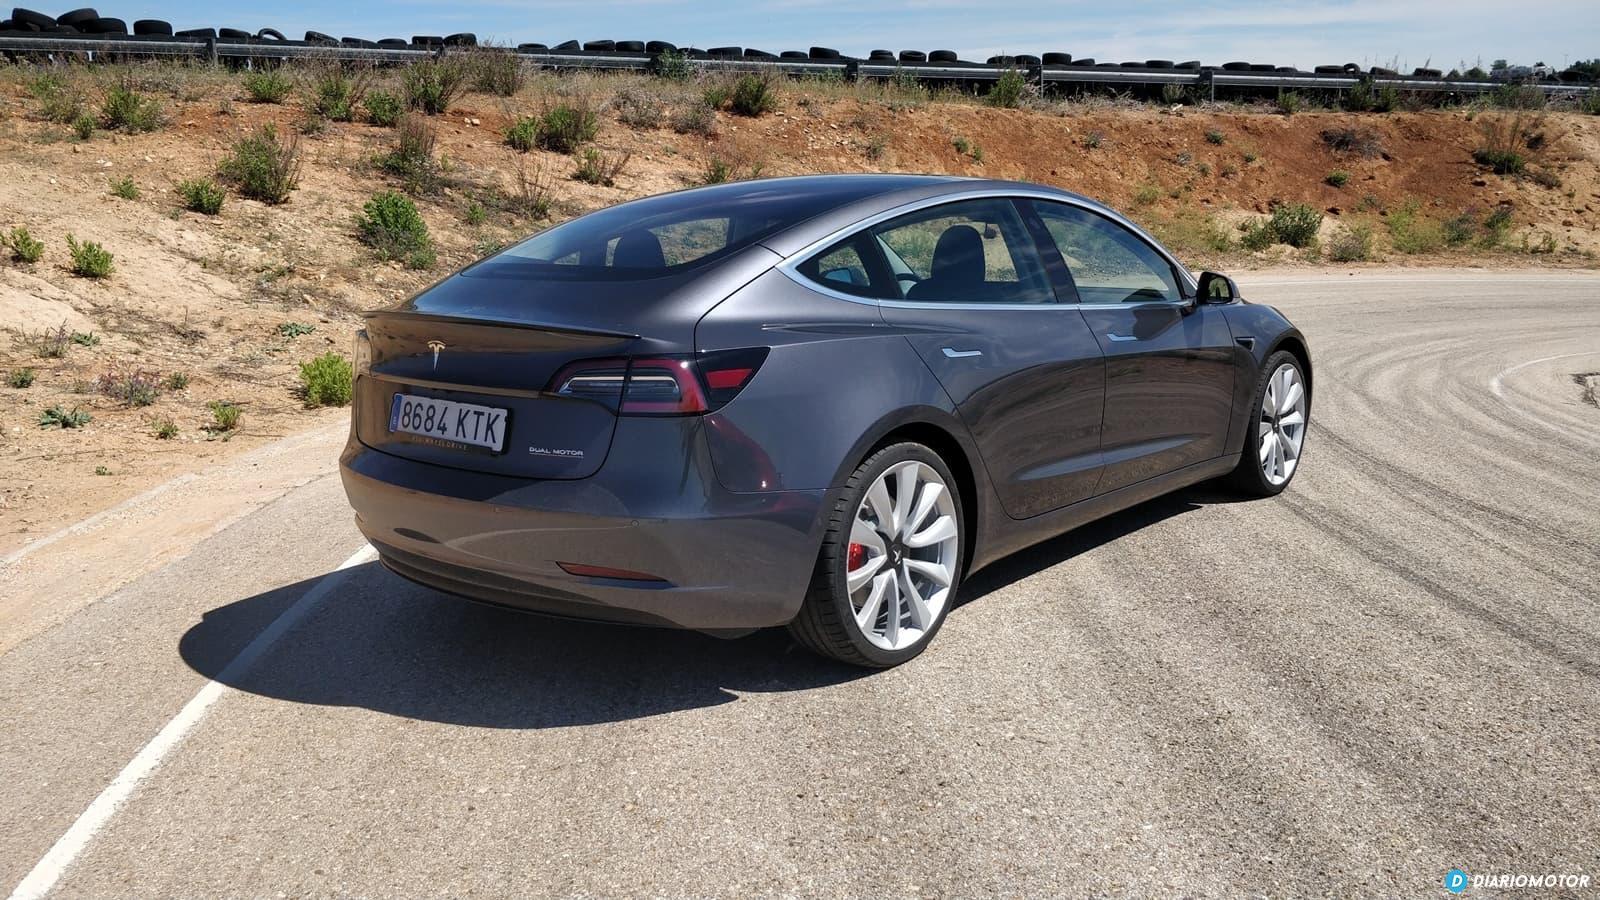 Tesla Model 3 Vs Alfa Romeo Giulia Quadrifoglio 0619 023